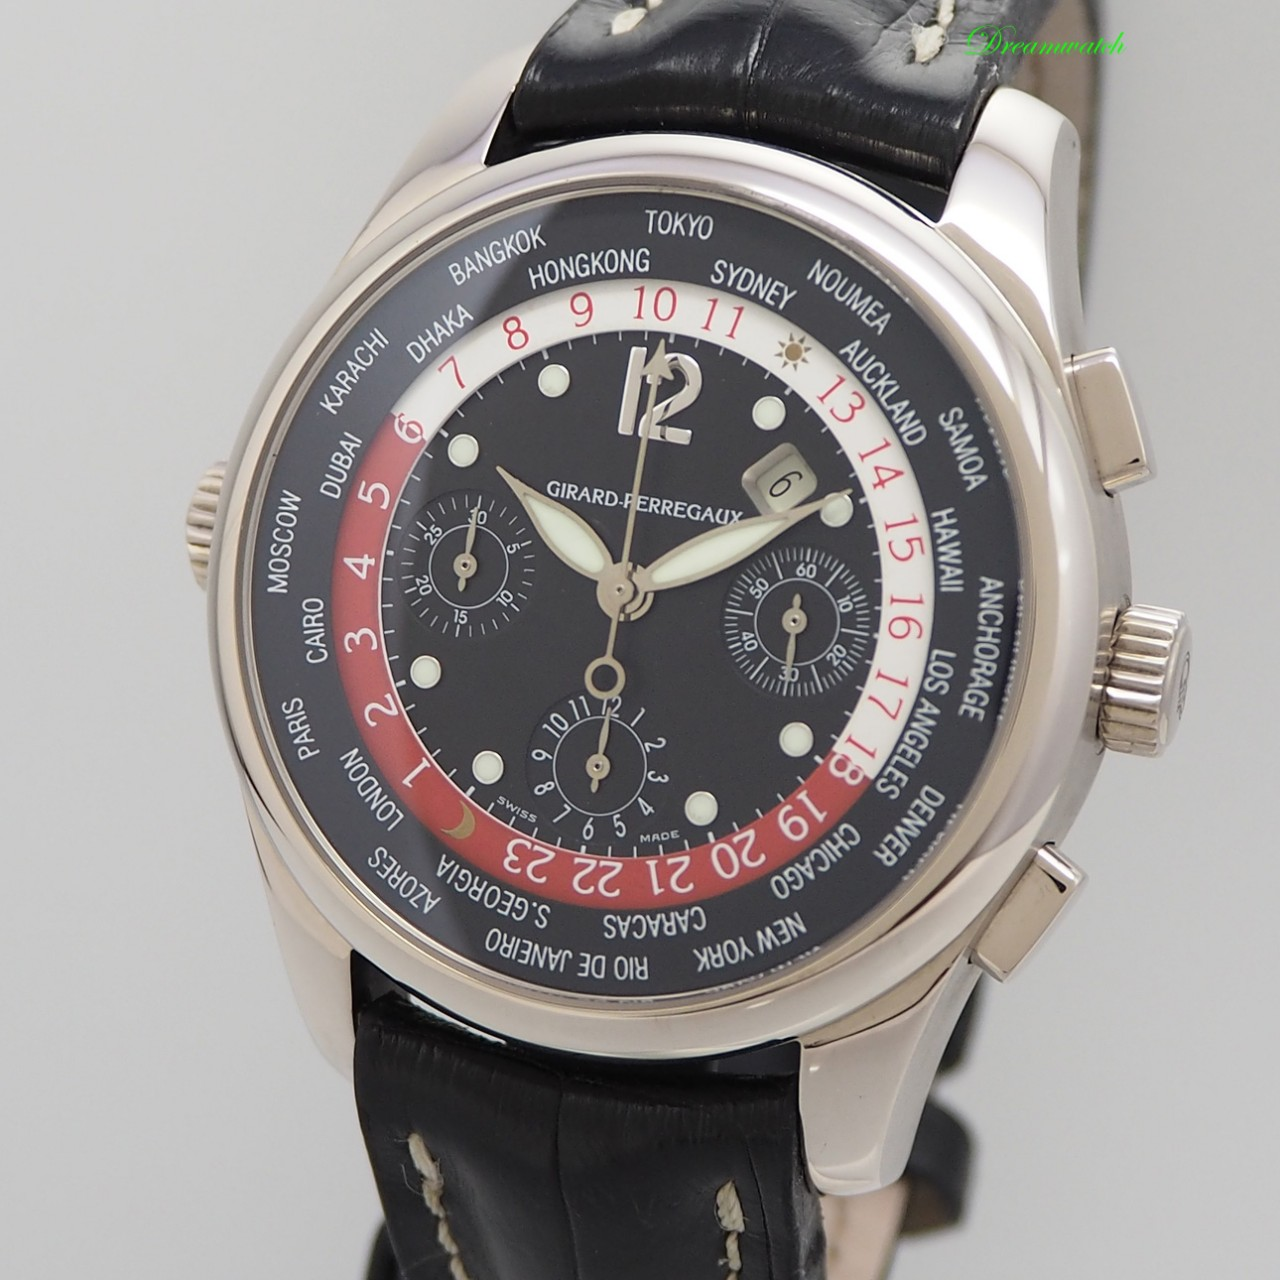 Girard Perregaux ww.tc World Time Chronograph 4980 WG 18k/750, Box+Papiere